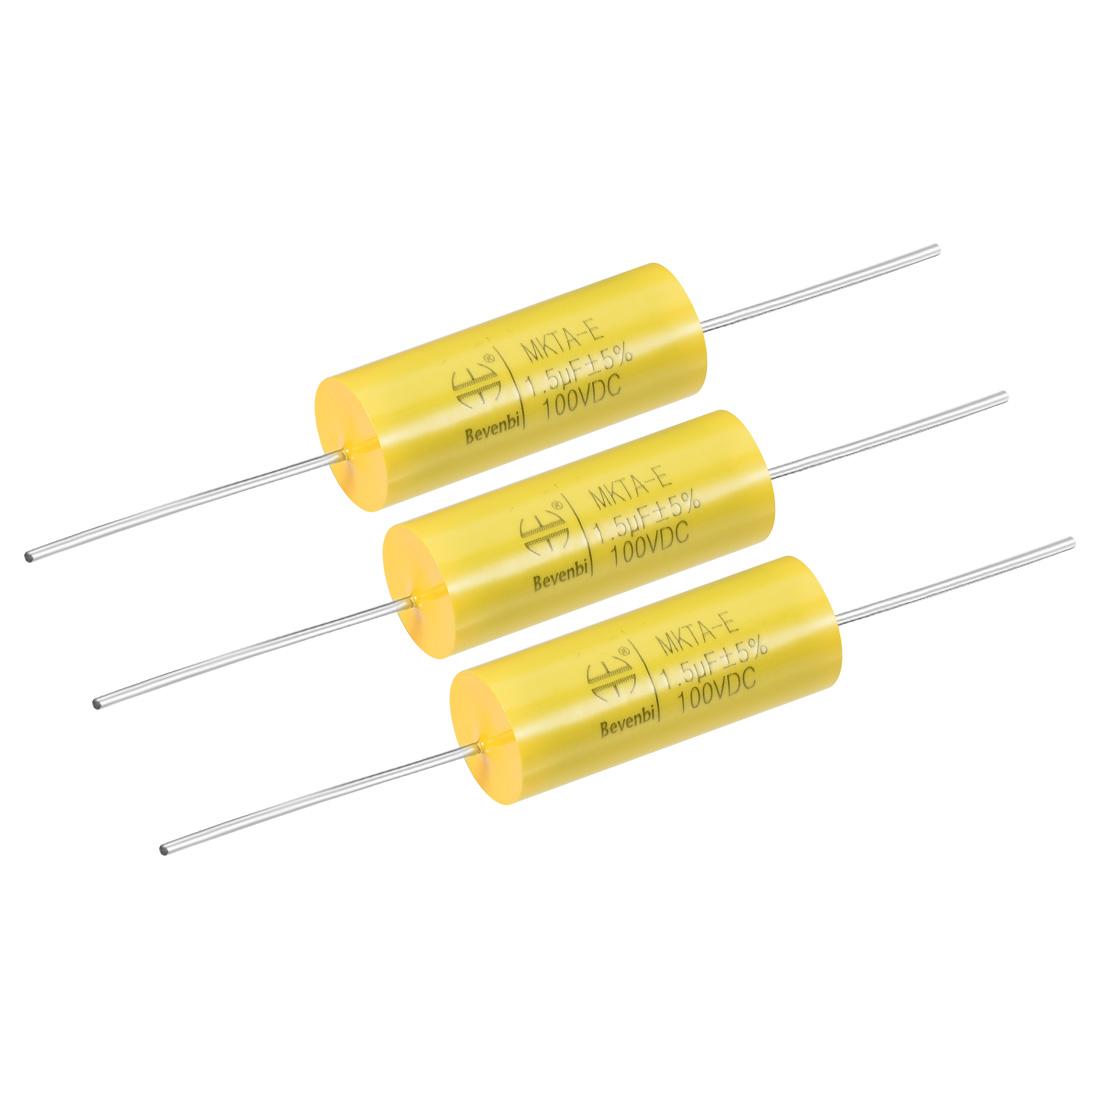 Film Capacitor 100V DC 1.5uF MKTA-E Round Polypropylene Capacitors Yellow 3pcs